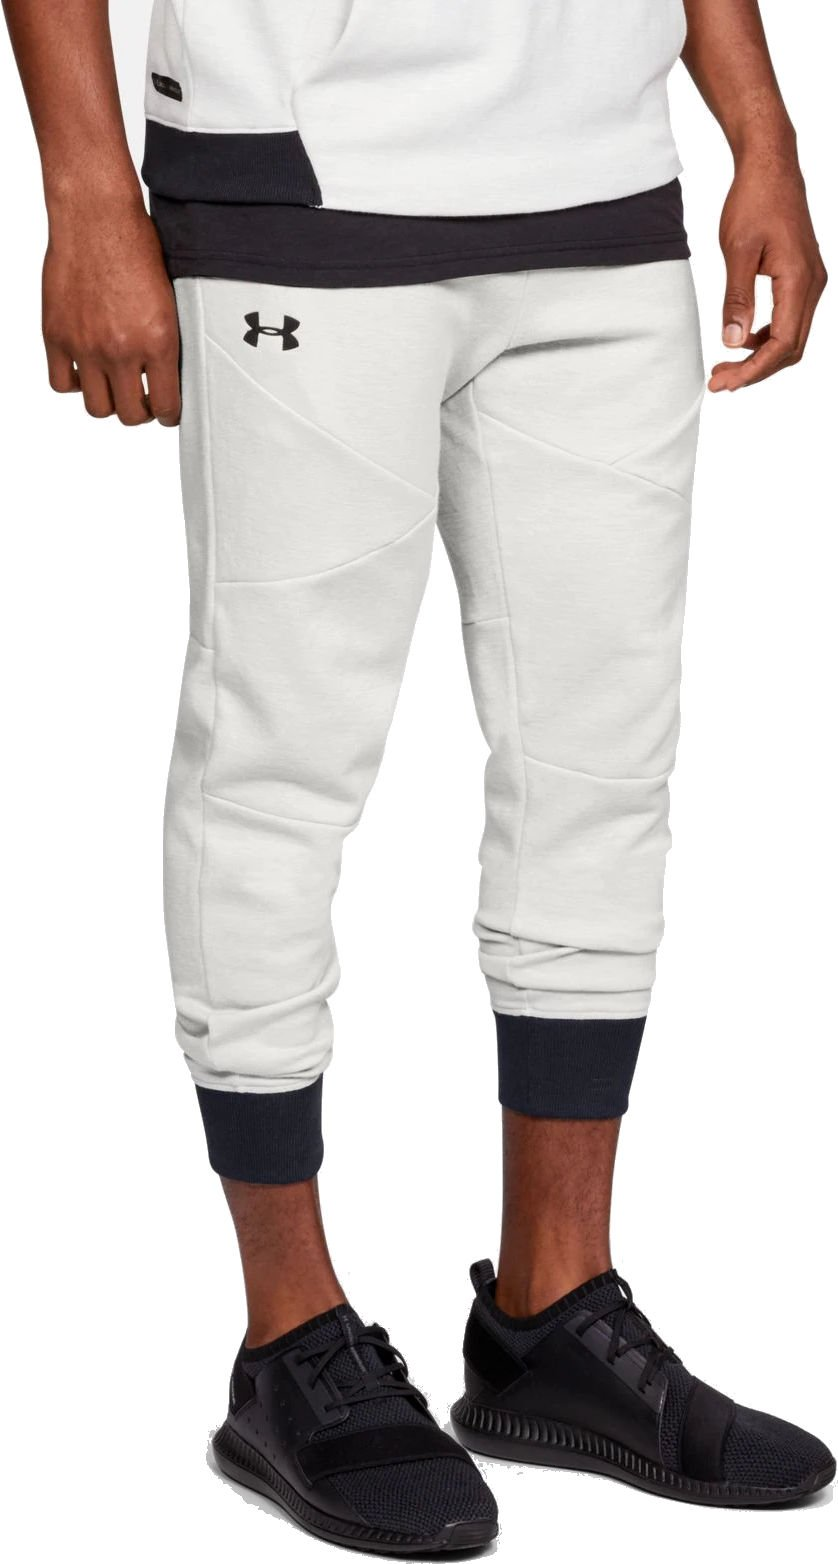 Kalhoty Under Armour UA Unstoppable 2X Knit Jogger